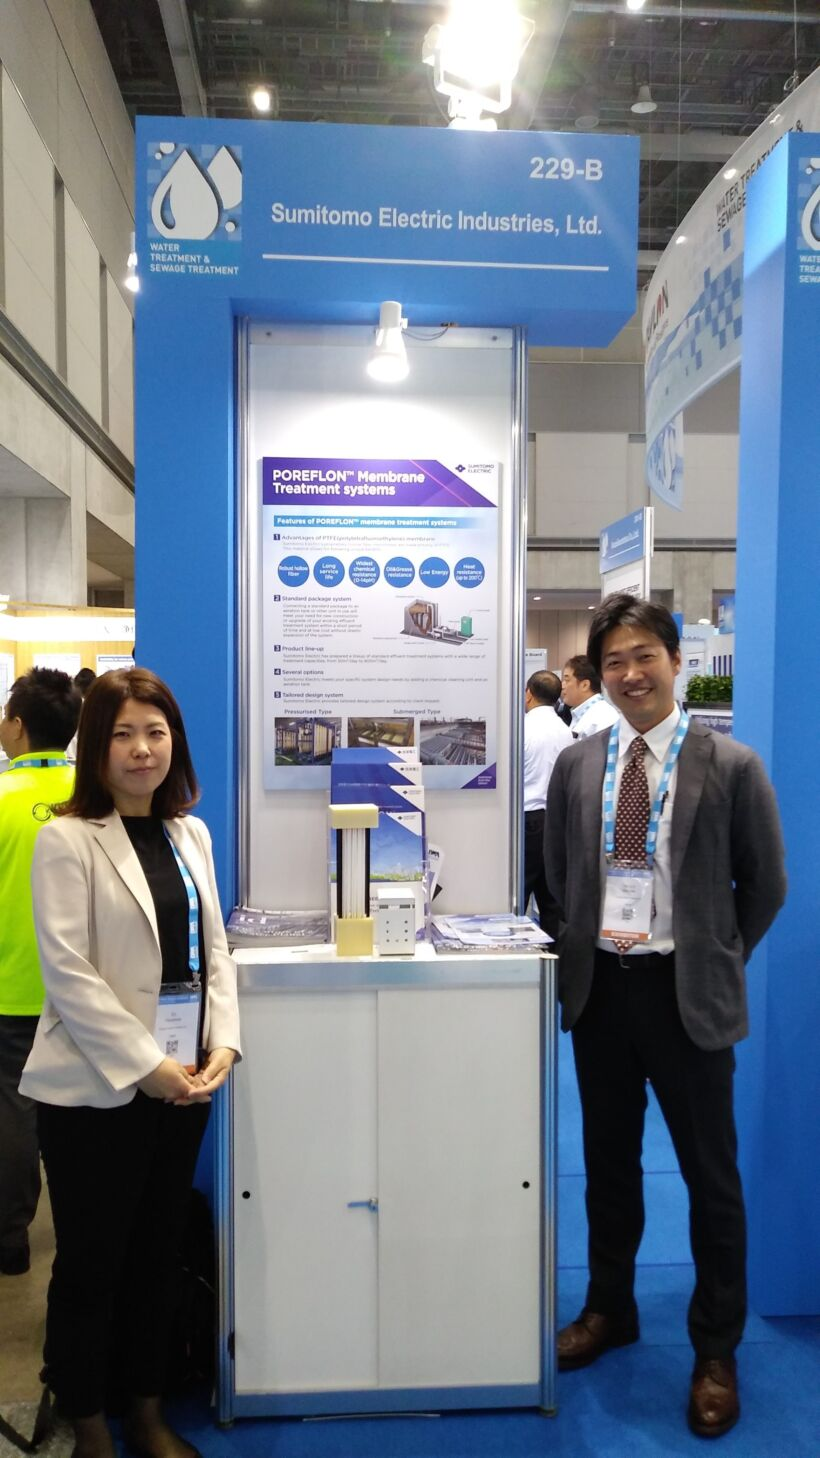 Sumitomo Corporation – Eri Hayashida and Takafumi Shinozaki of the Water Processing Division of Sumitomo Electric Industries | News Iwa 2018 Sumitomo